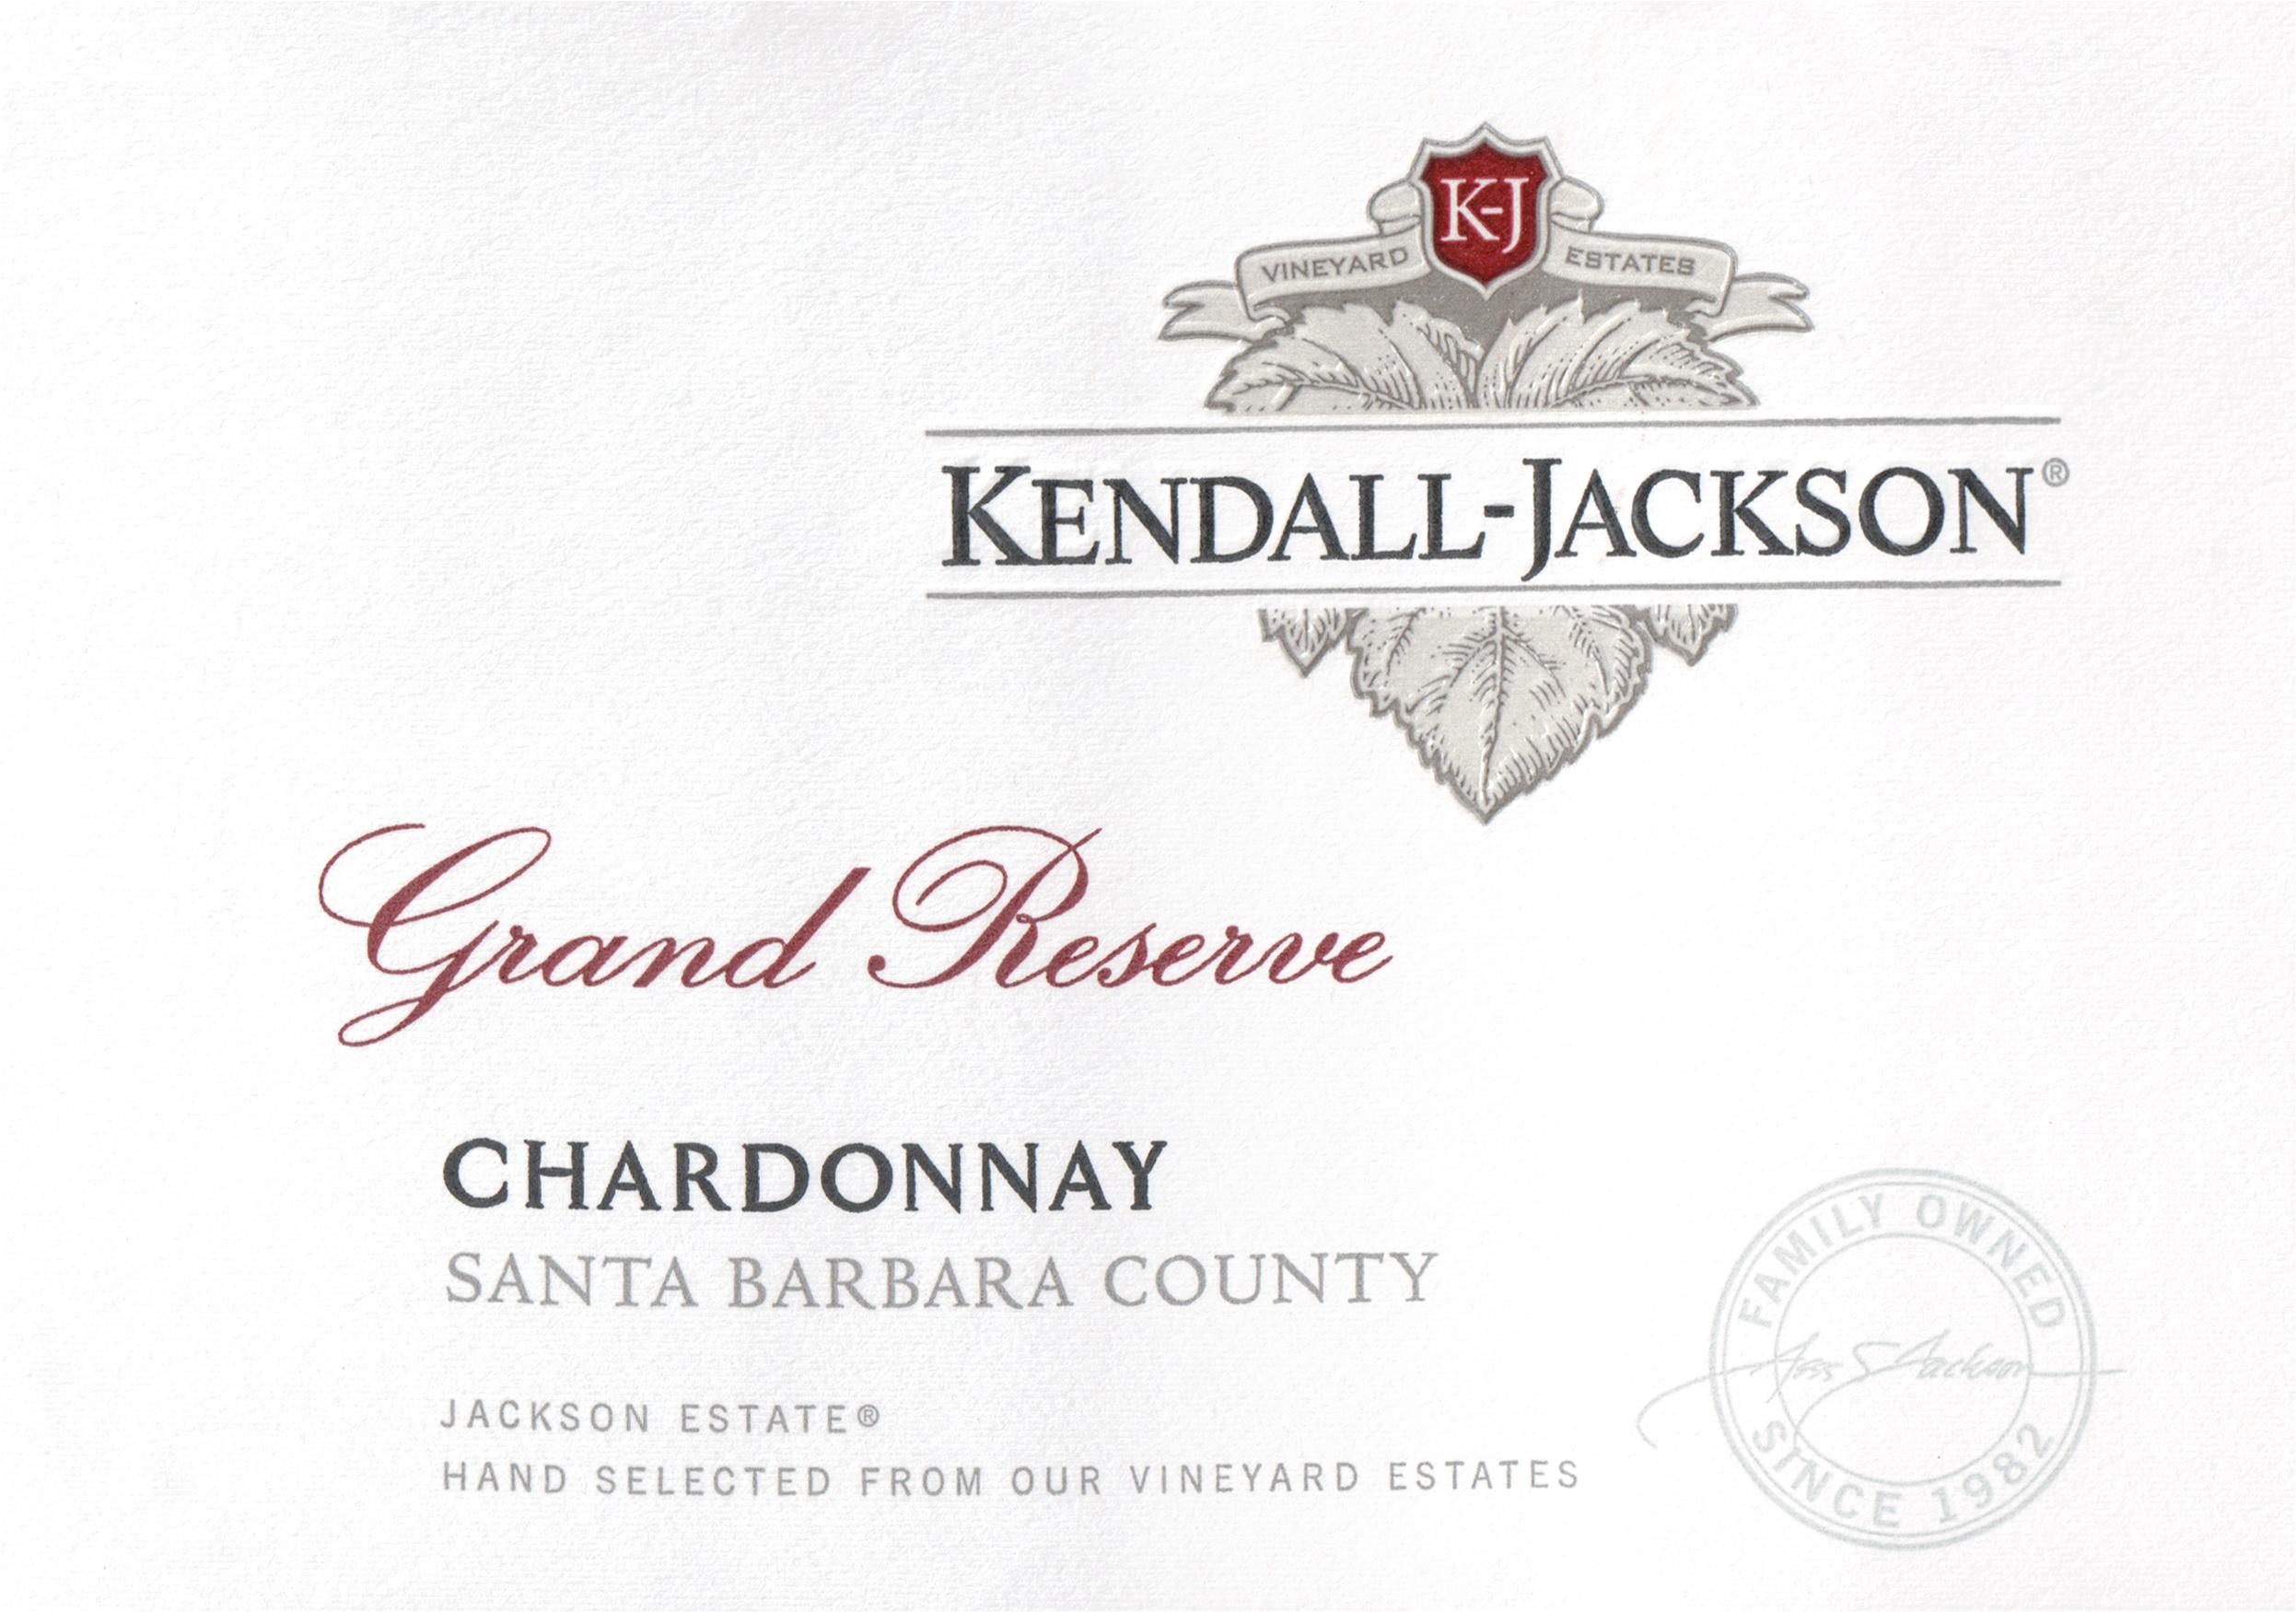 Kendall Jackson Grand Reserve Chardonnay 2018